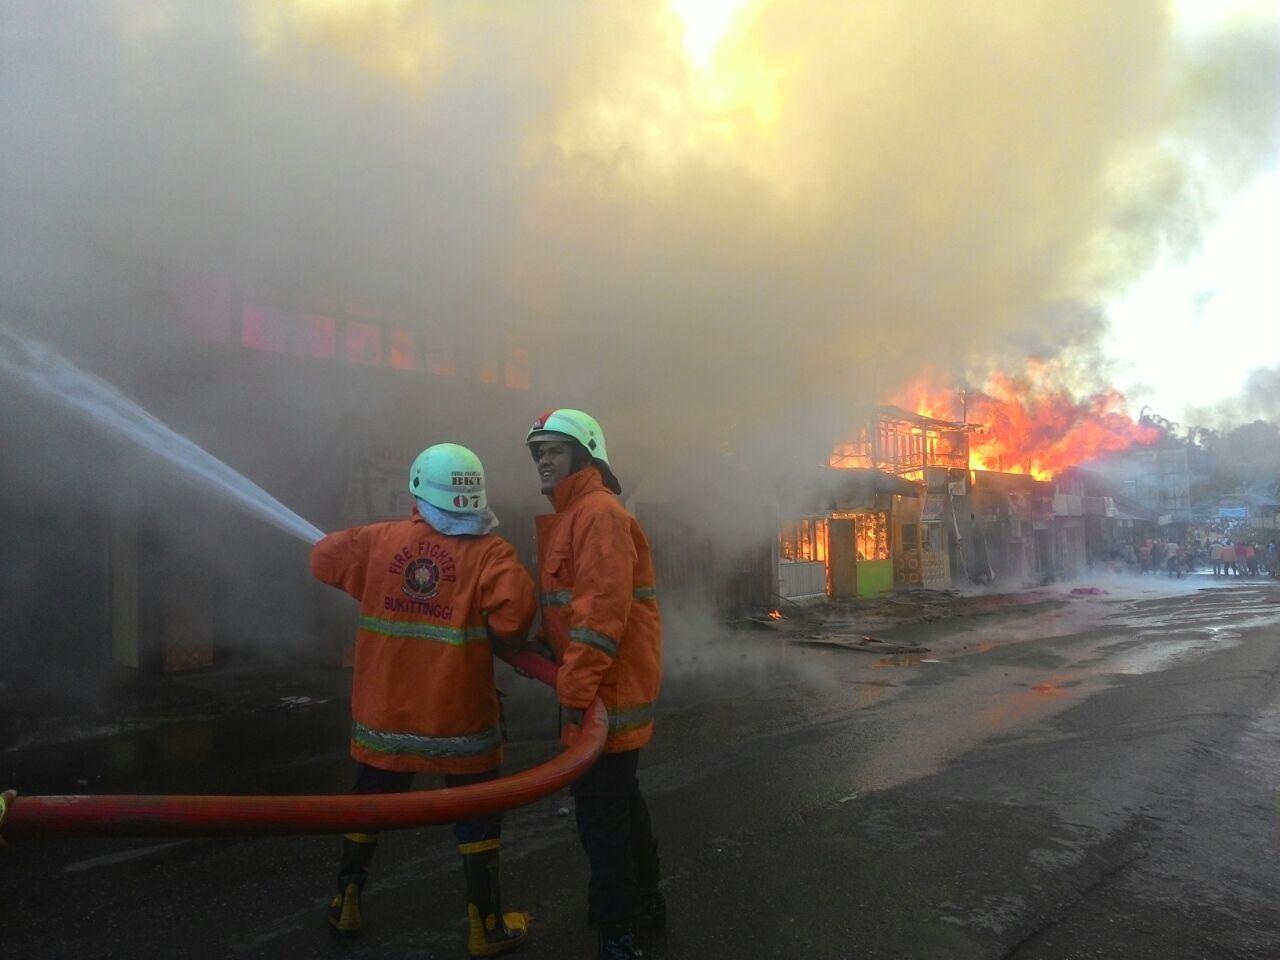 Kebakaran kios di Koto Baru, Kabupaten Tanah Datar.